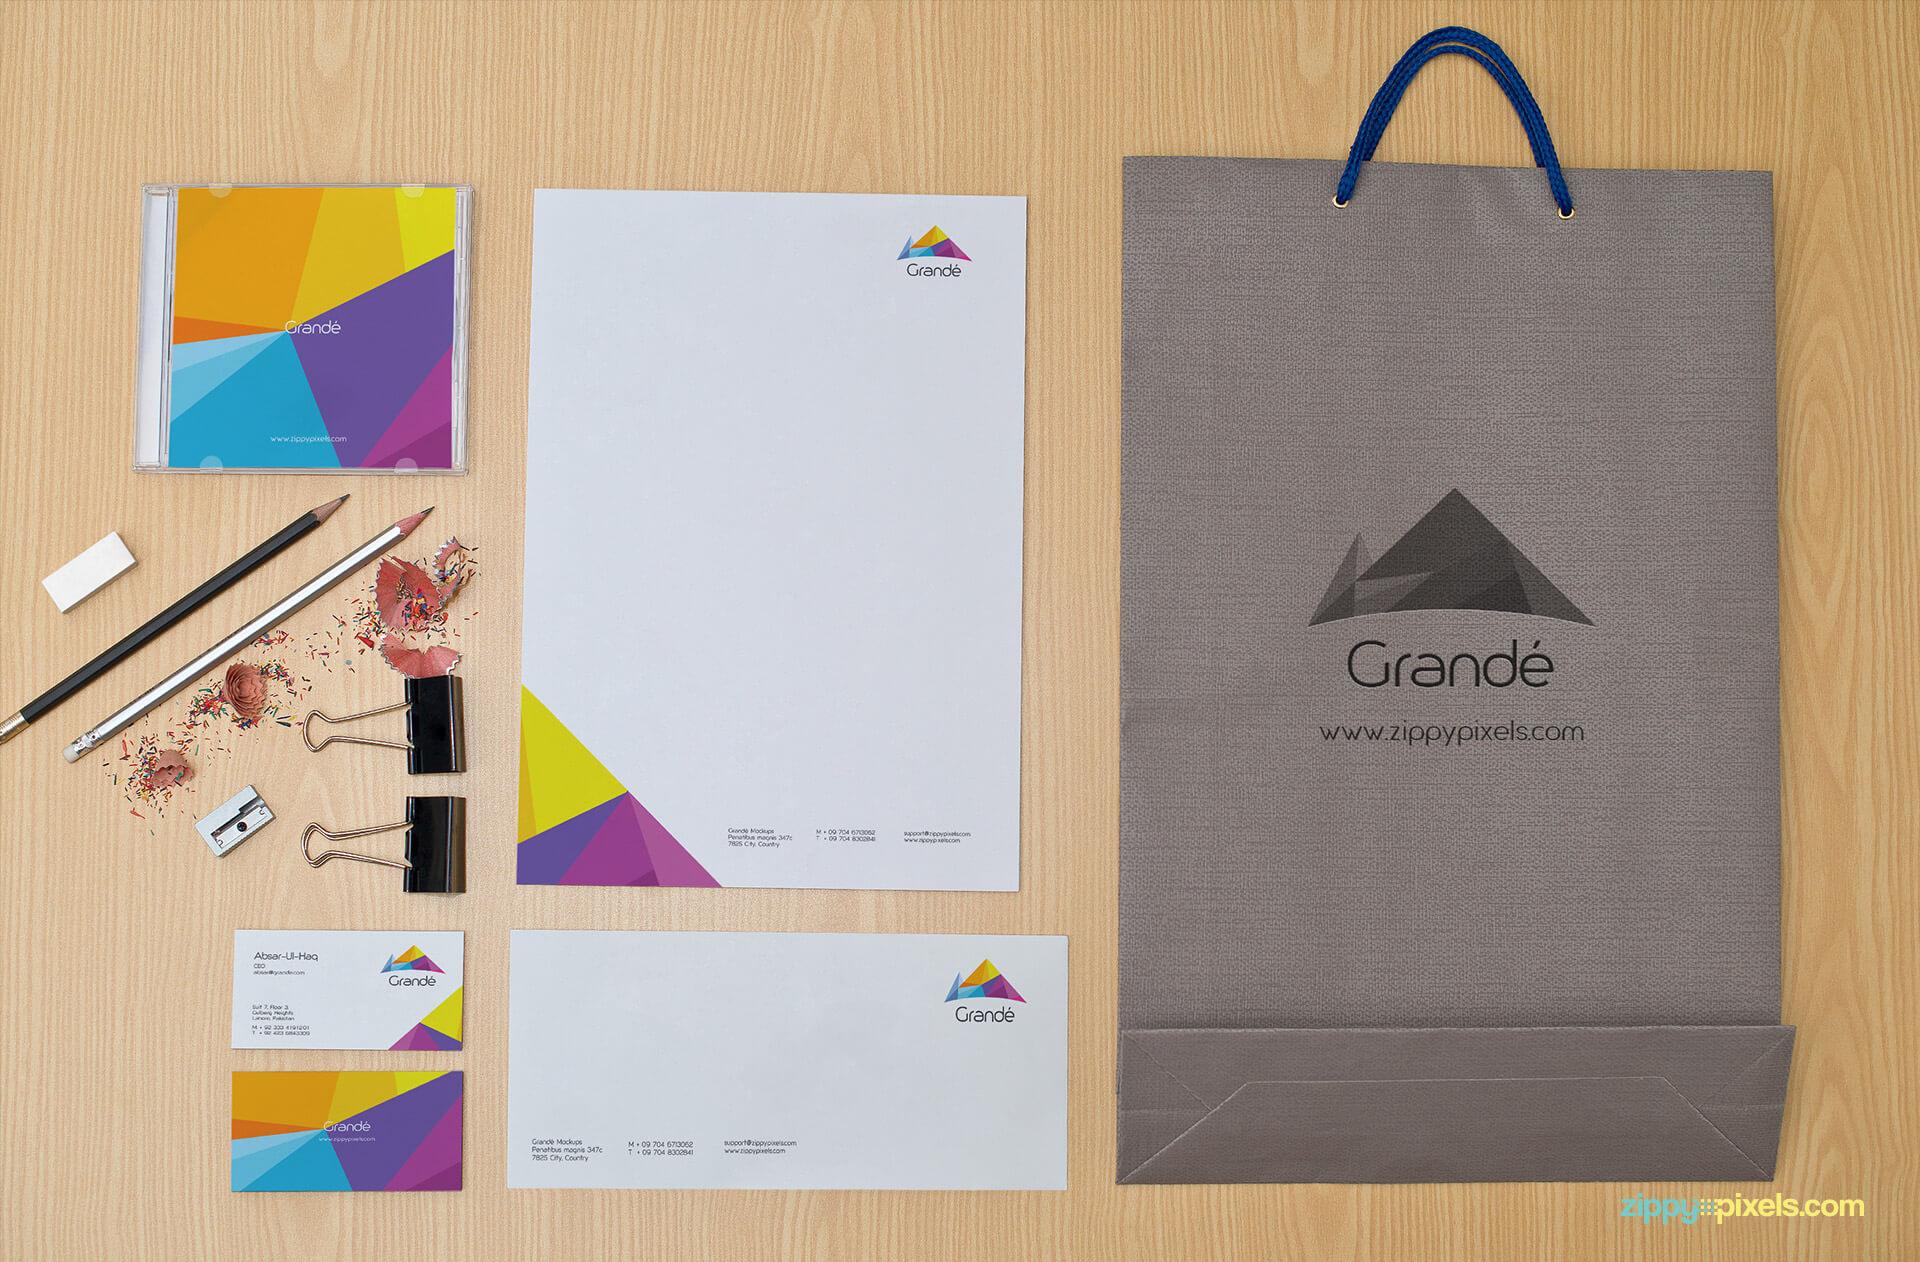 Stationery Mockup of Letterhead, Bag, Business Cards and Envelope